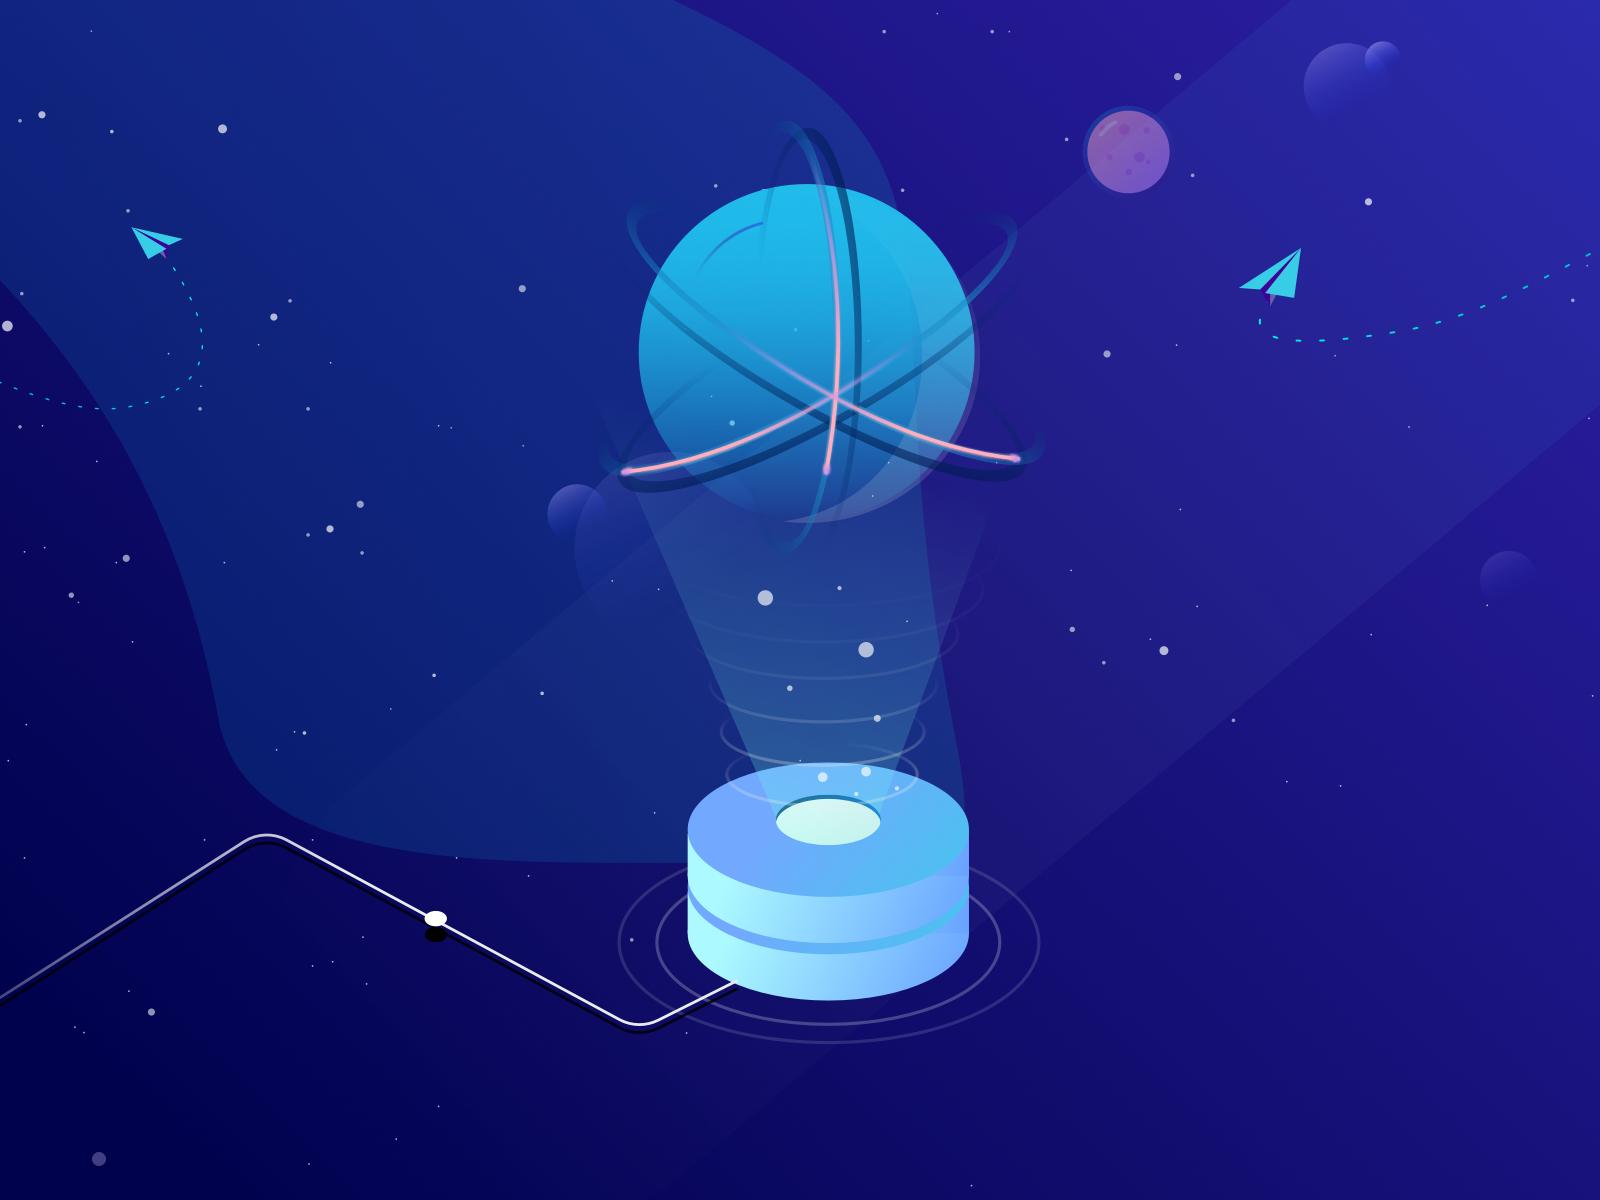 Orbit creation 2x